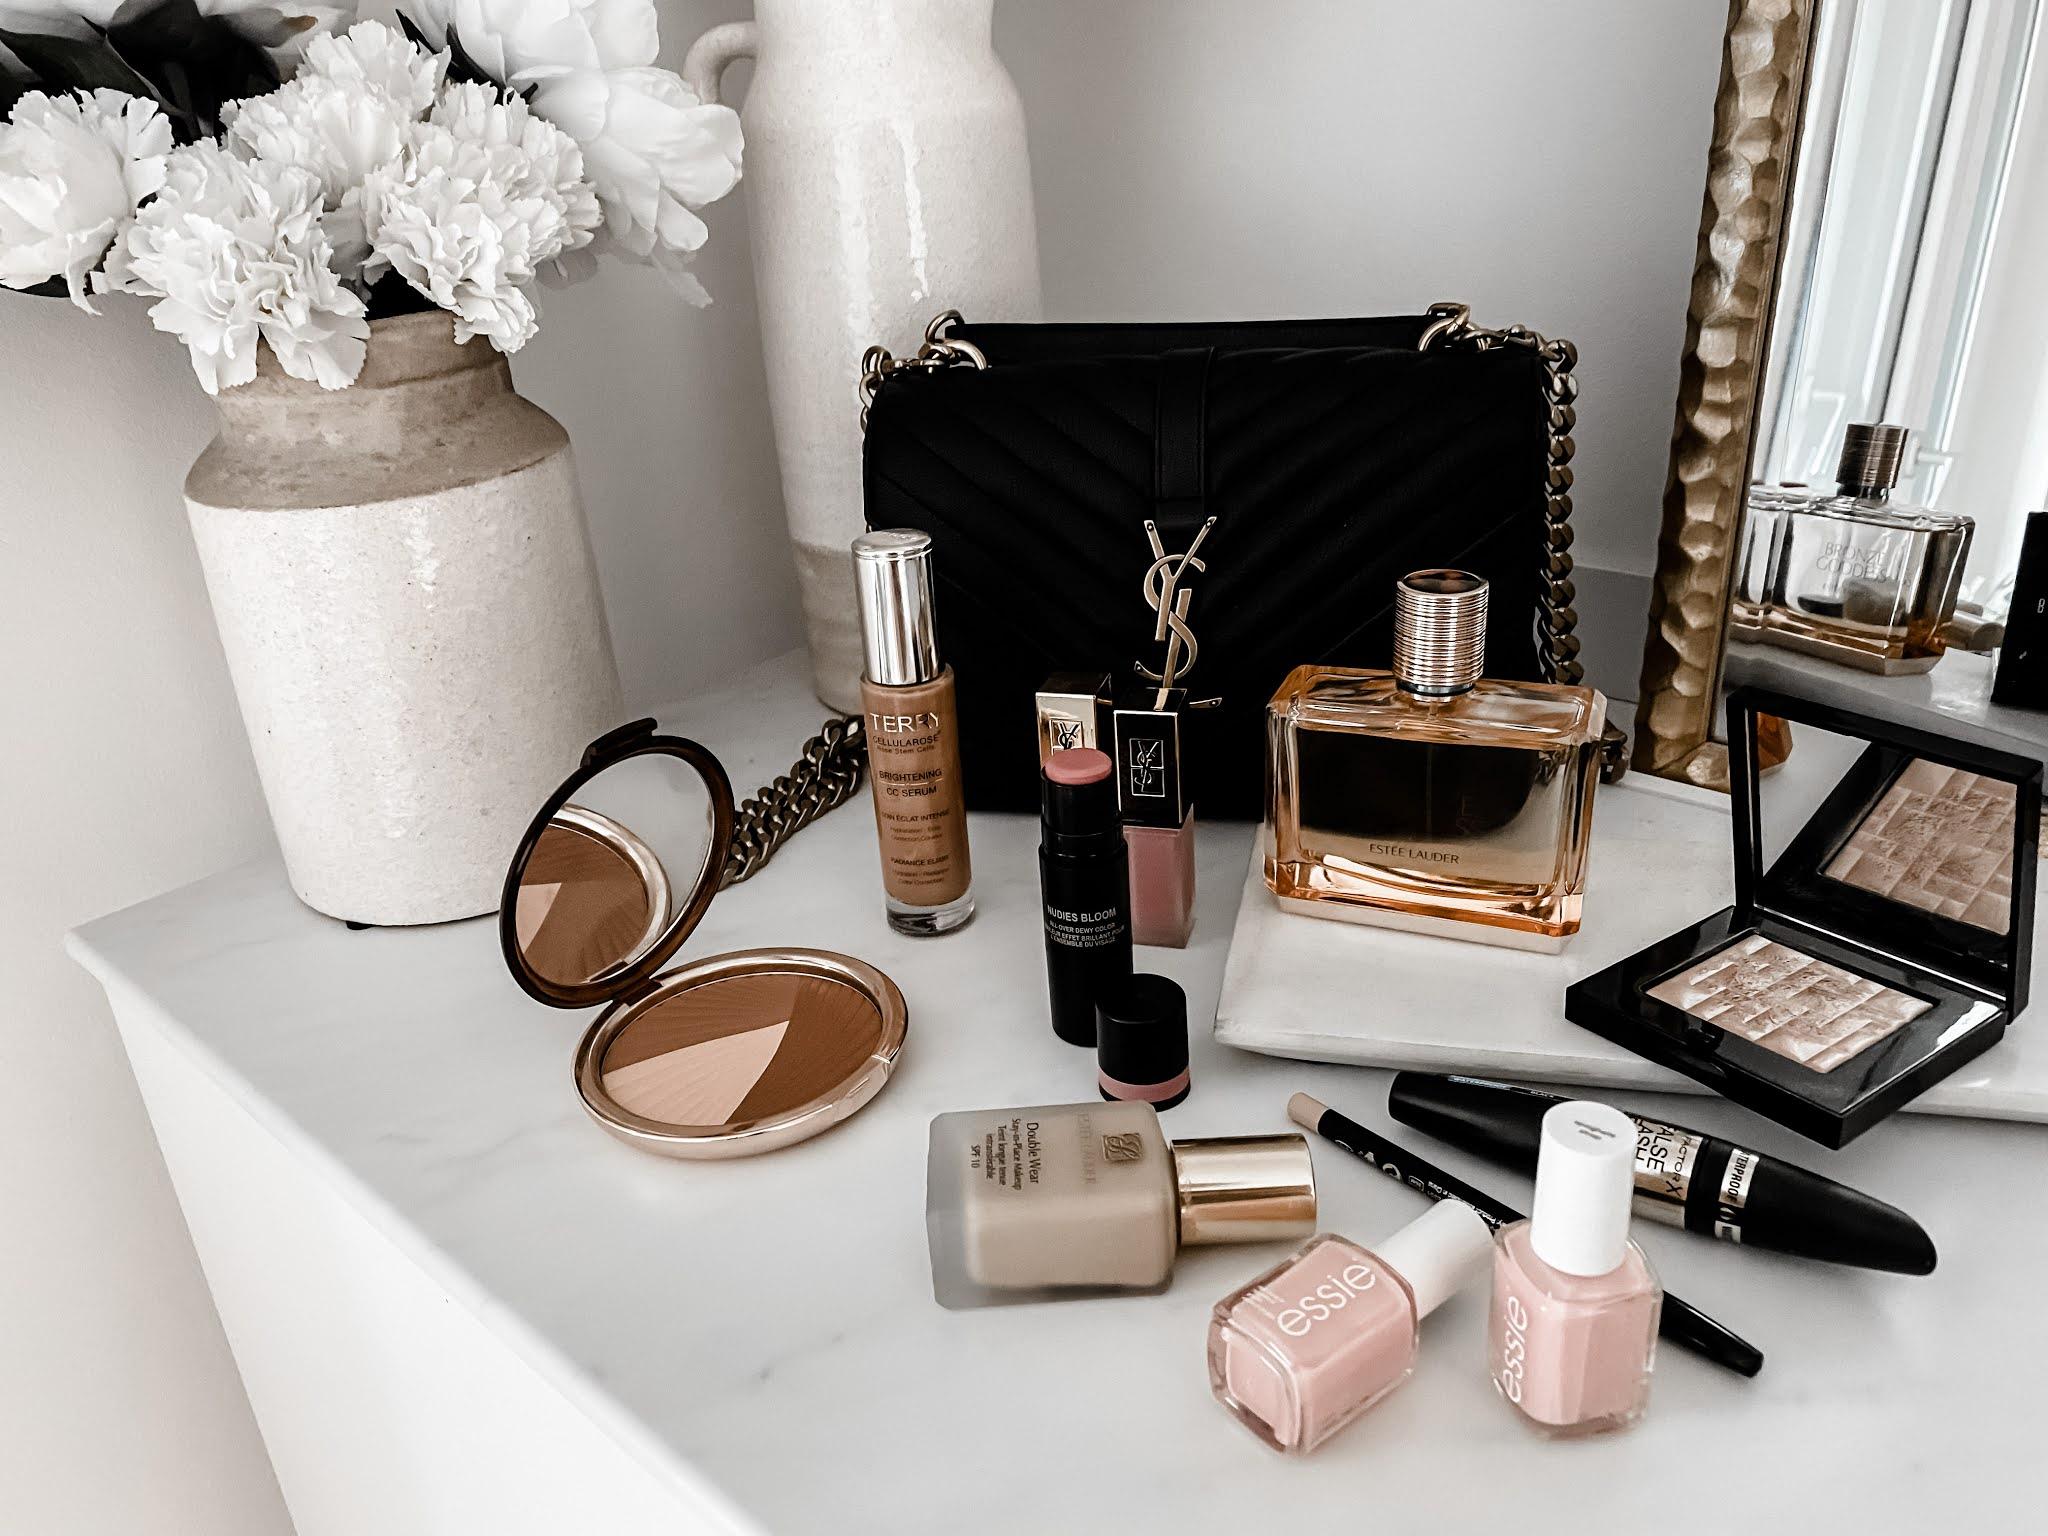 Summer Beauty Makeup Products Estee Lauder, Bobbi Brown, Nudestix, Essie, By Terry